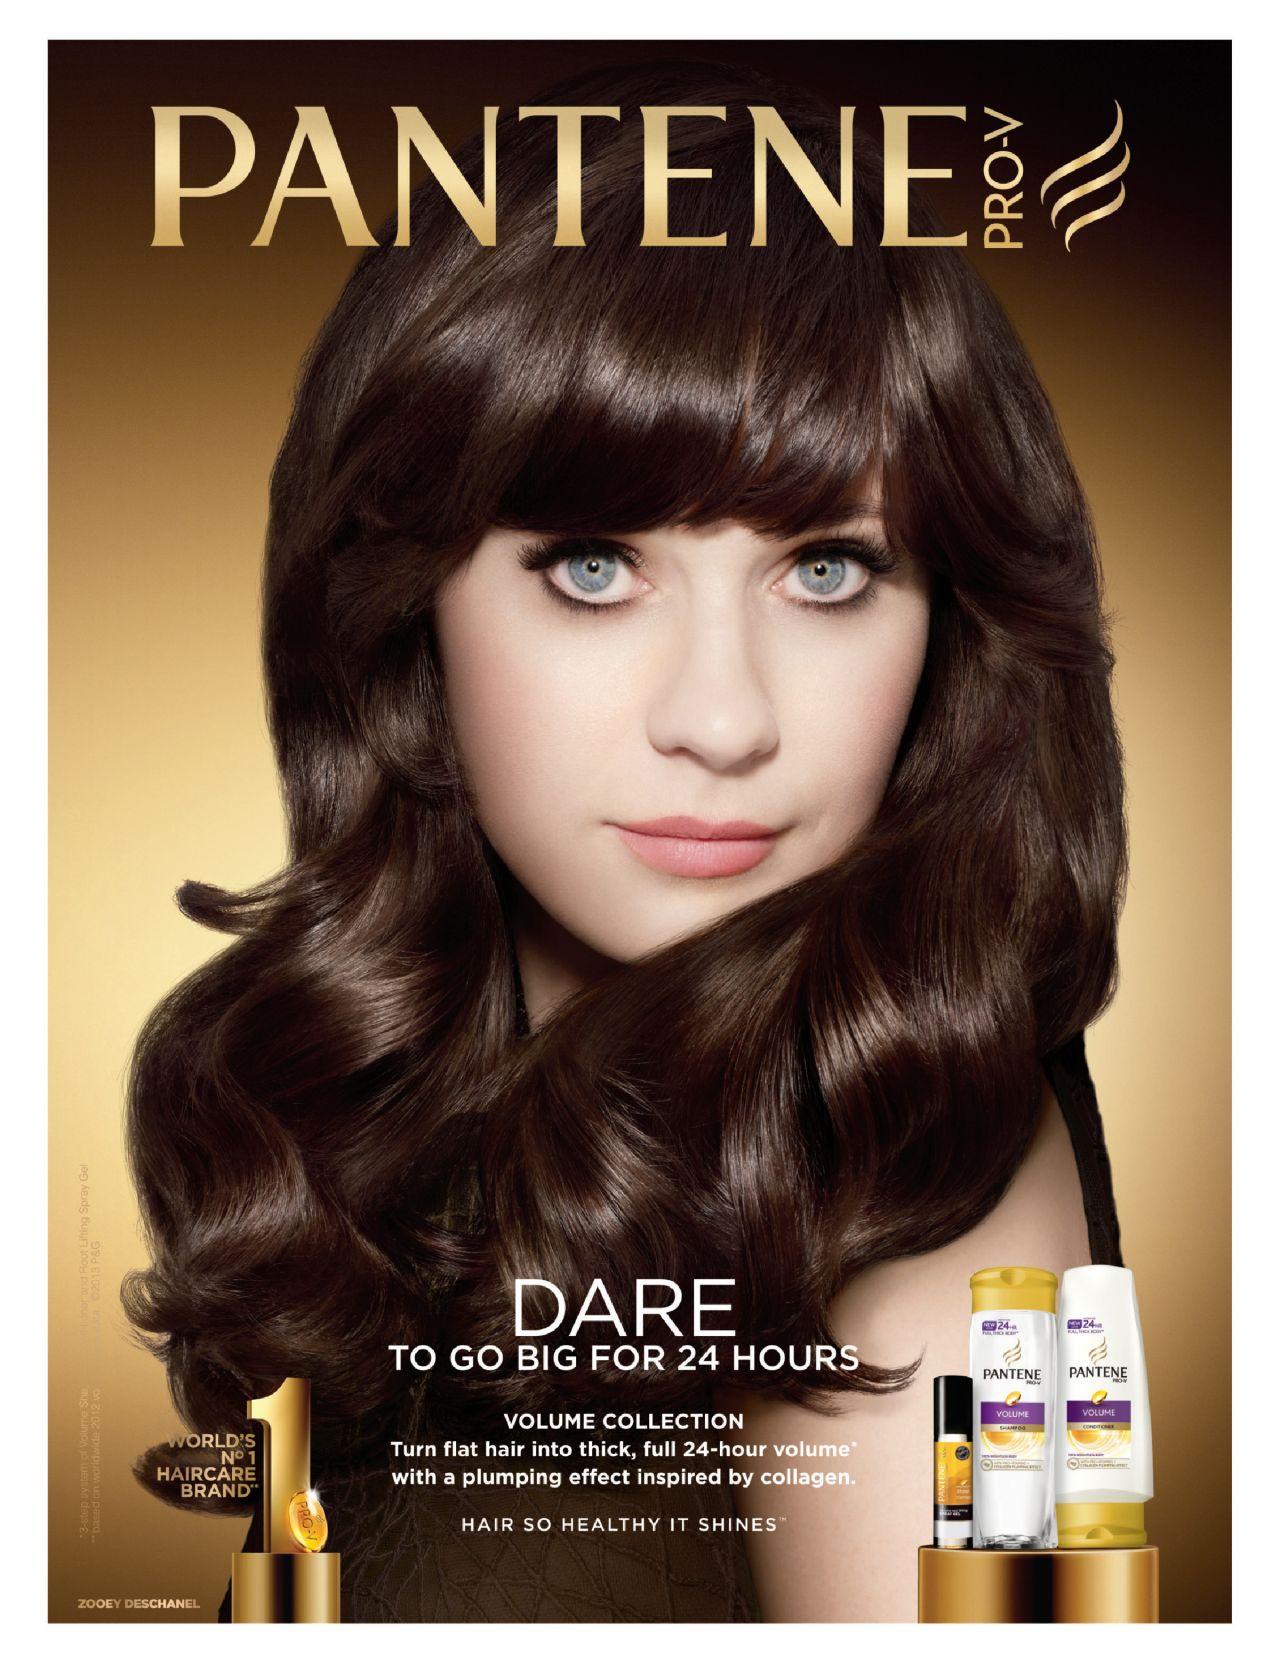 Zooey Deschanel Pantene Pro V Ad Campaign 2013